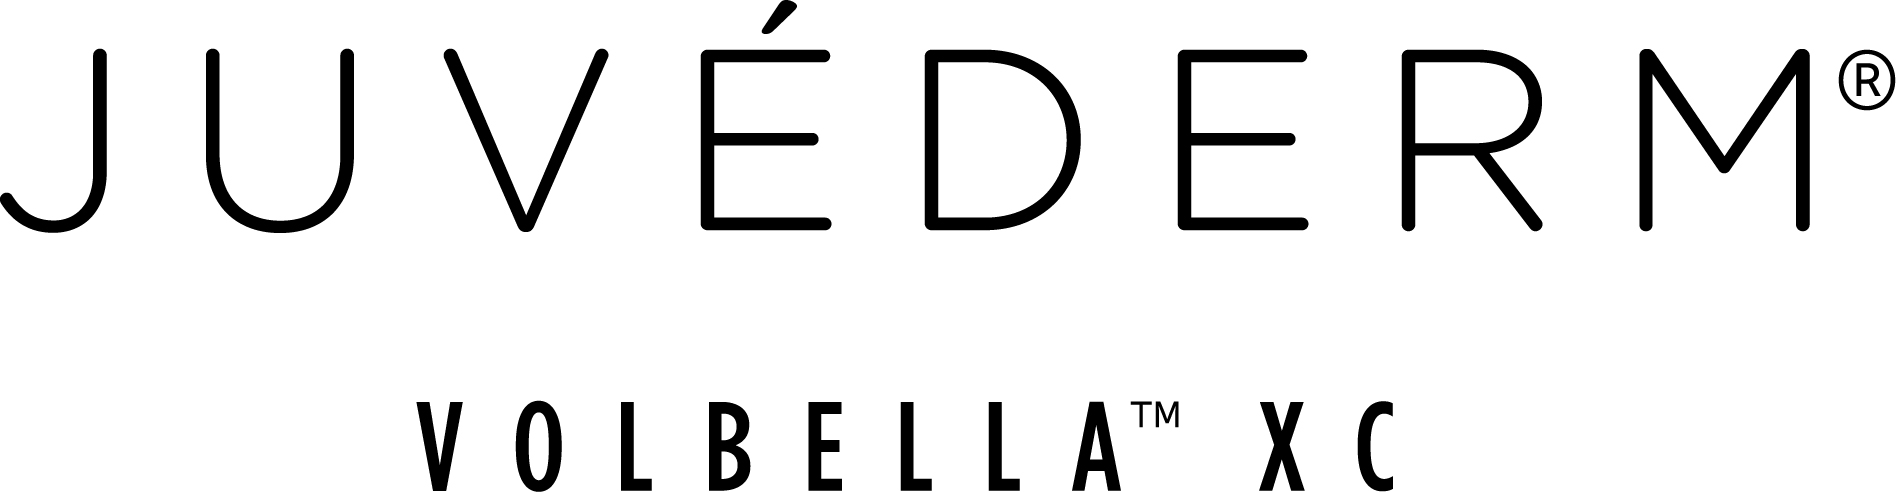 New Juvederm Volbella XC logo